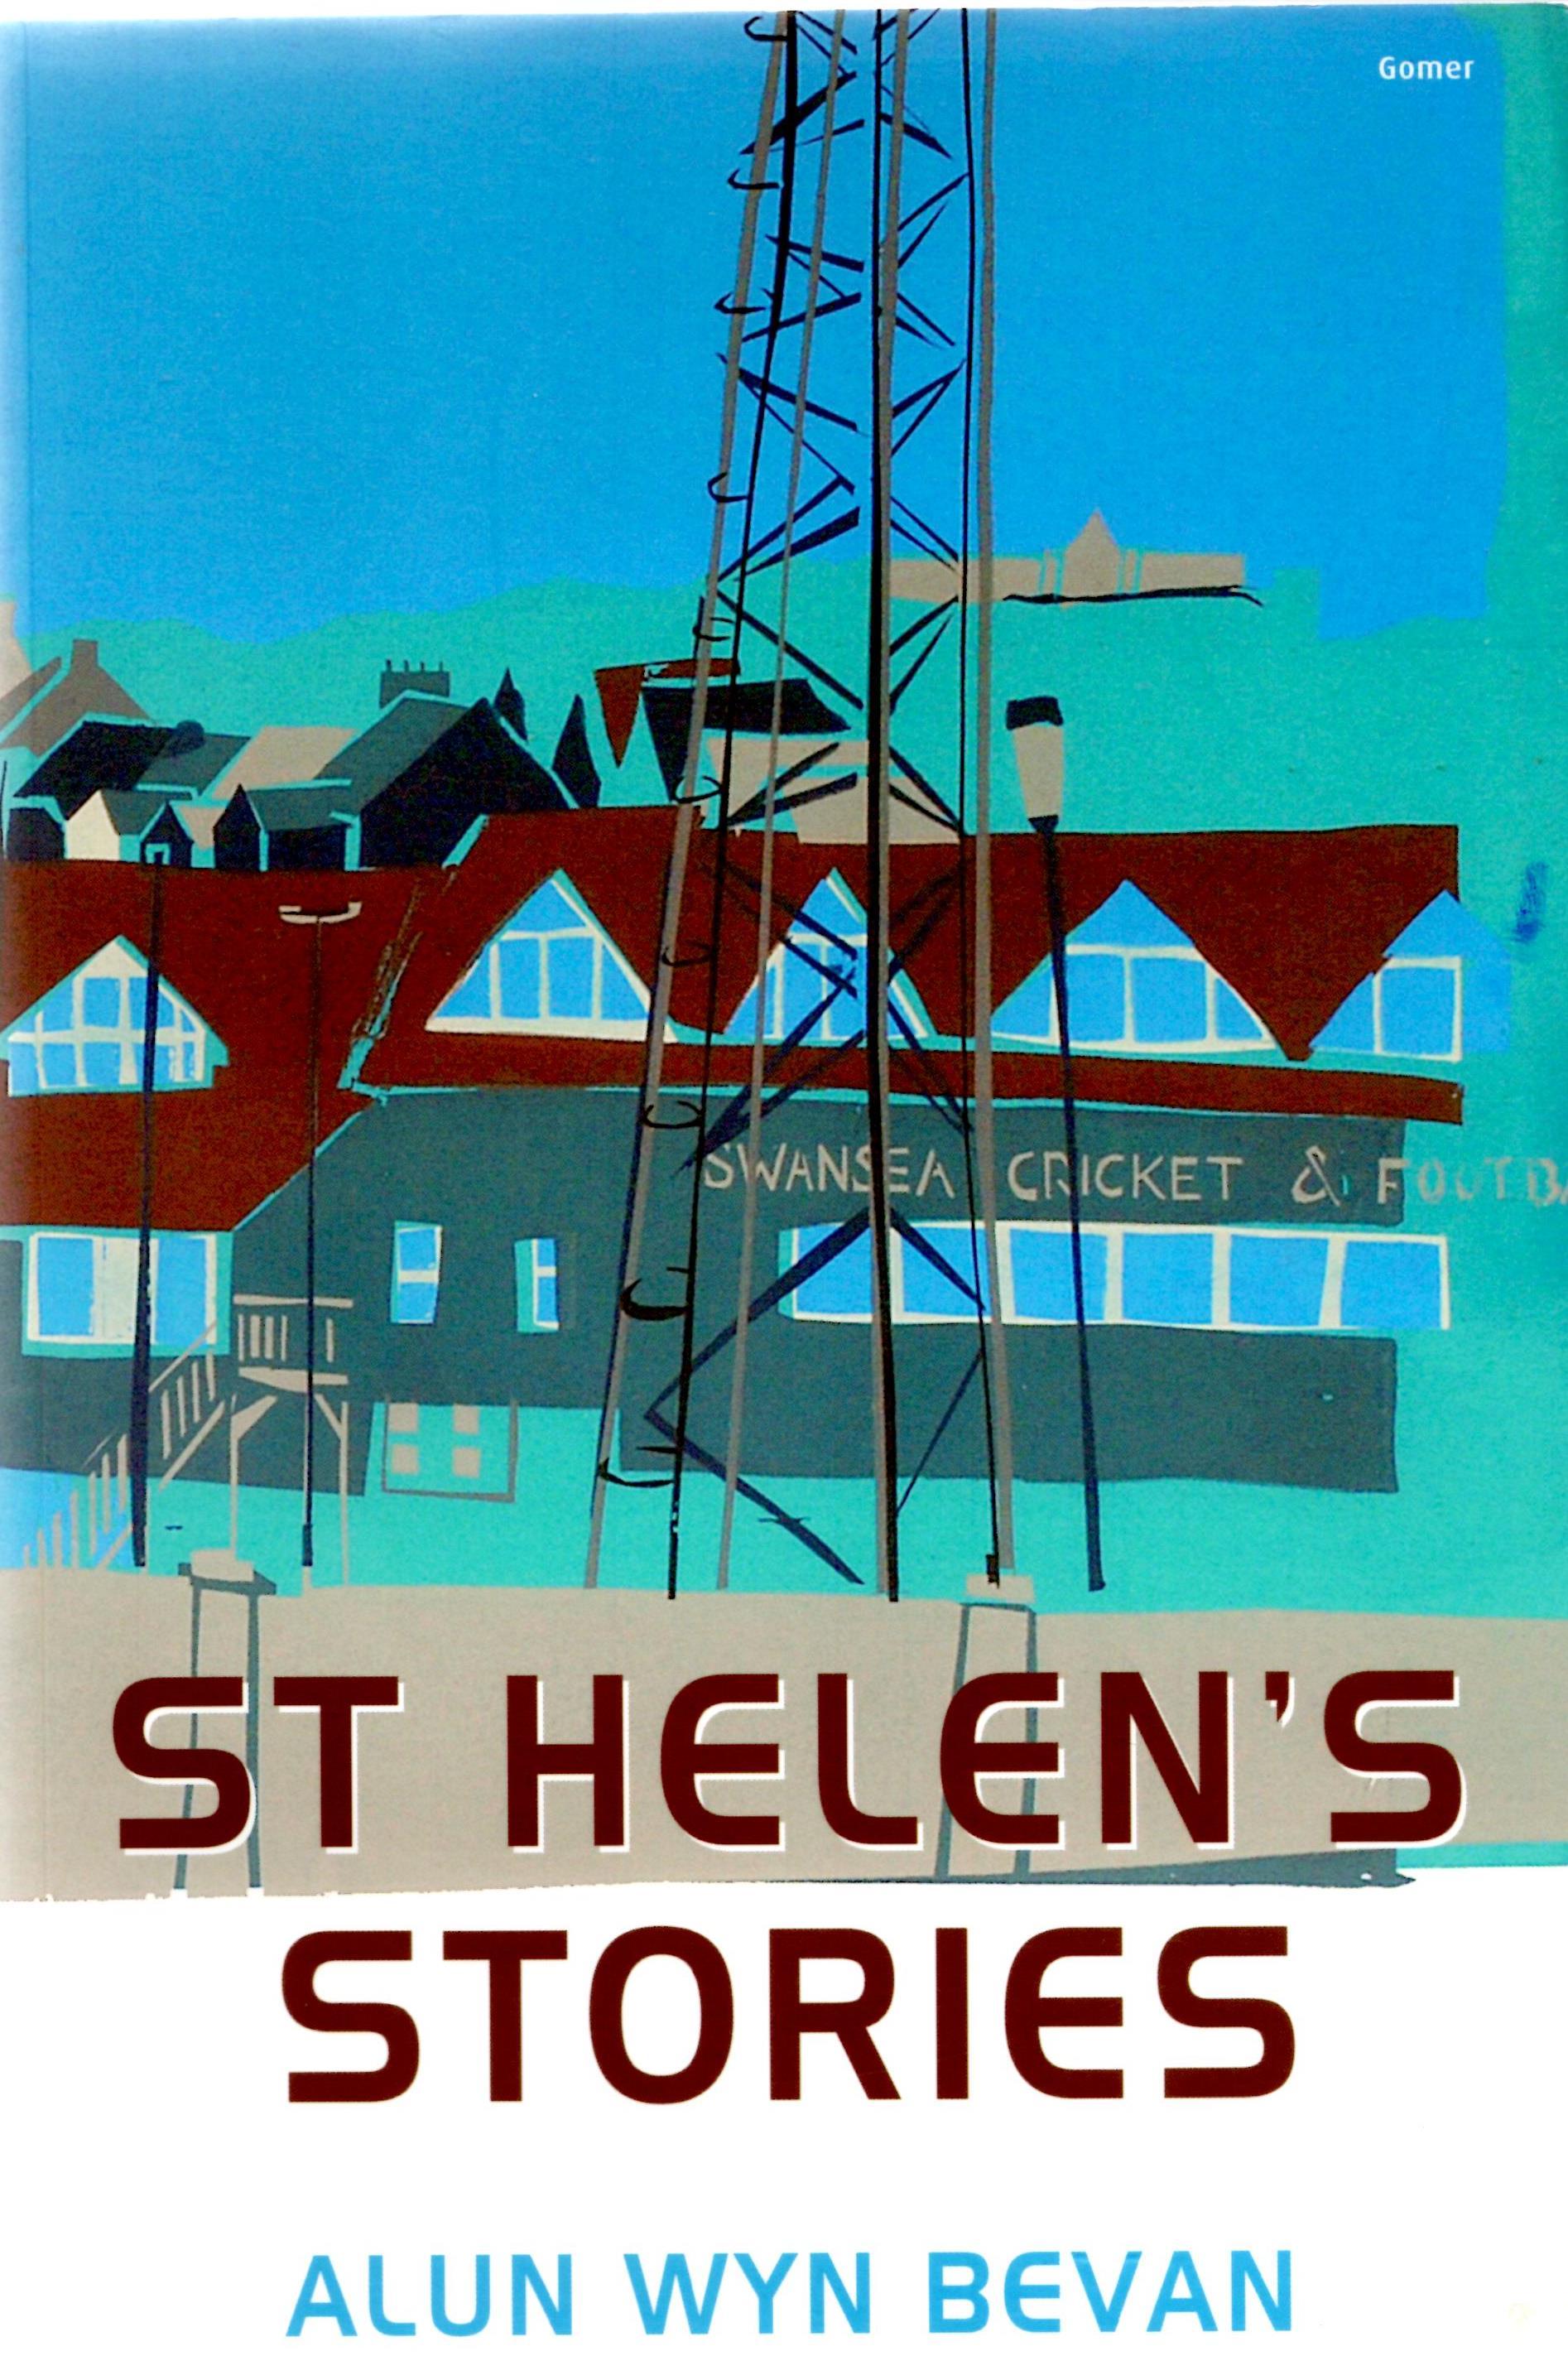 St. Helen's Stories